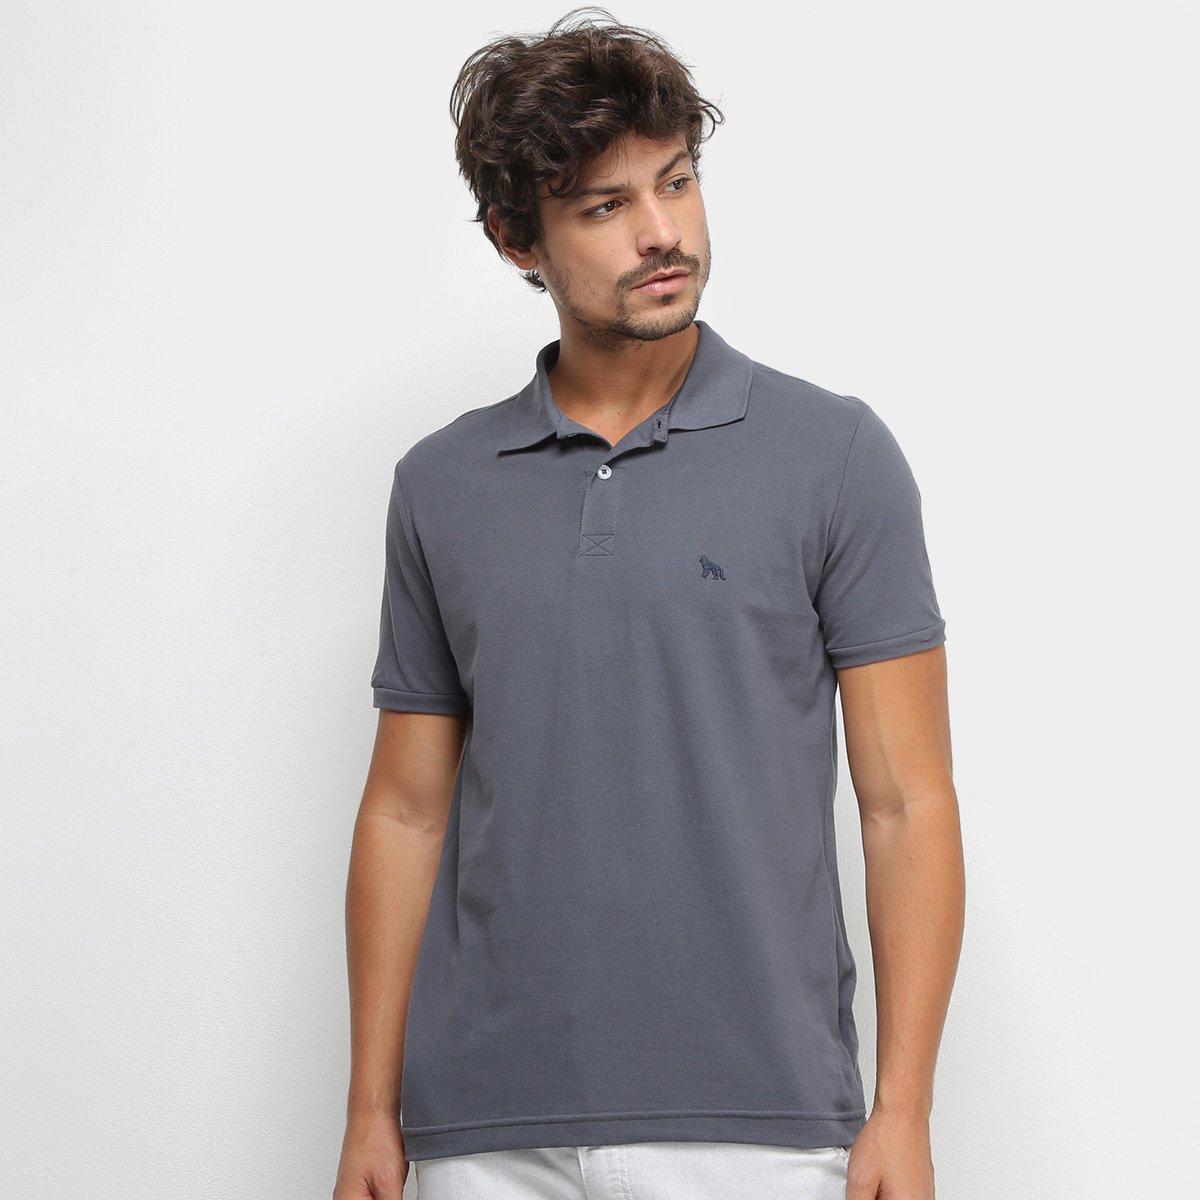 Camisa Polo Acostamento Masculina - Tam: GG